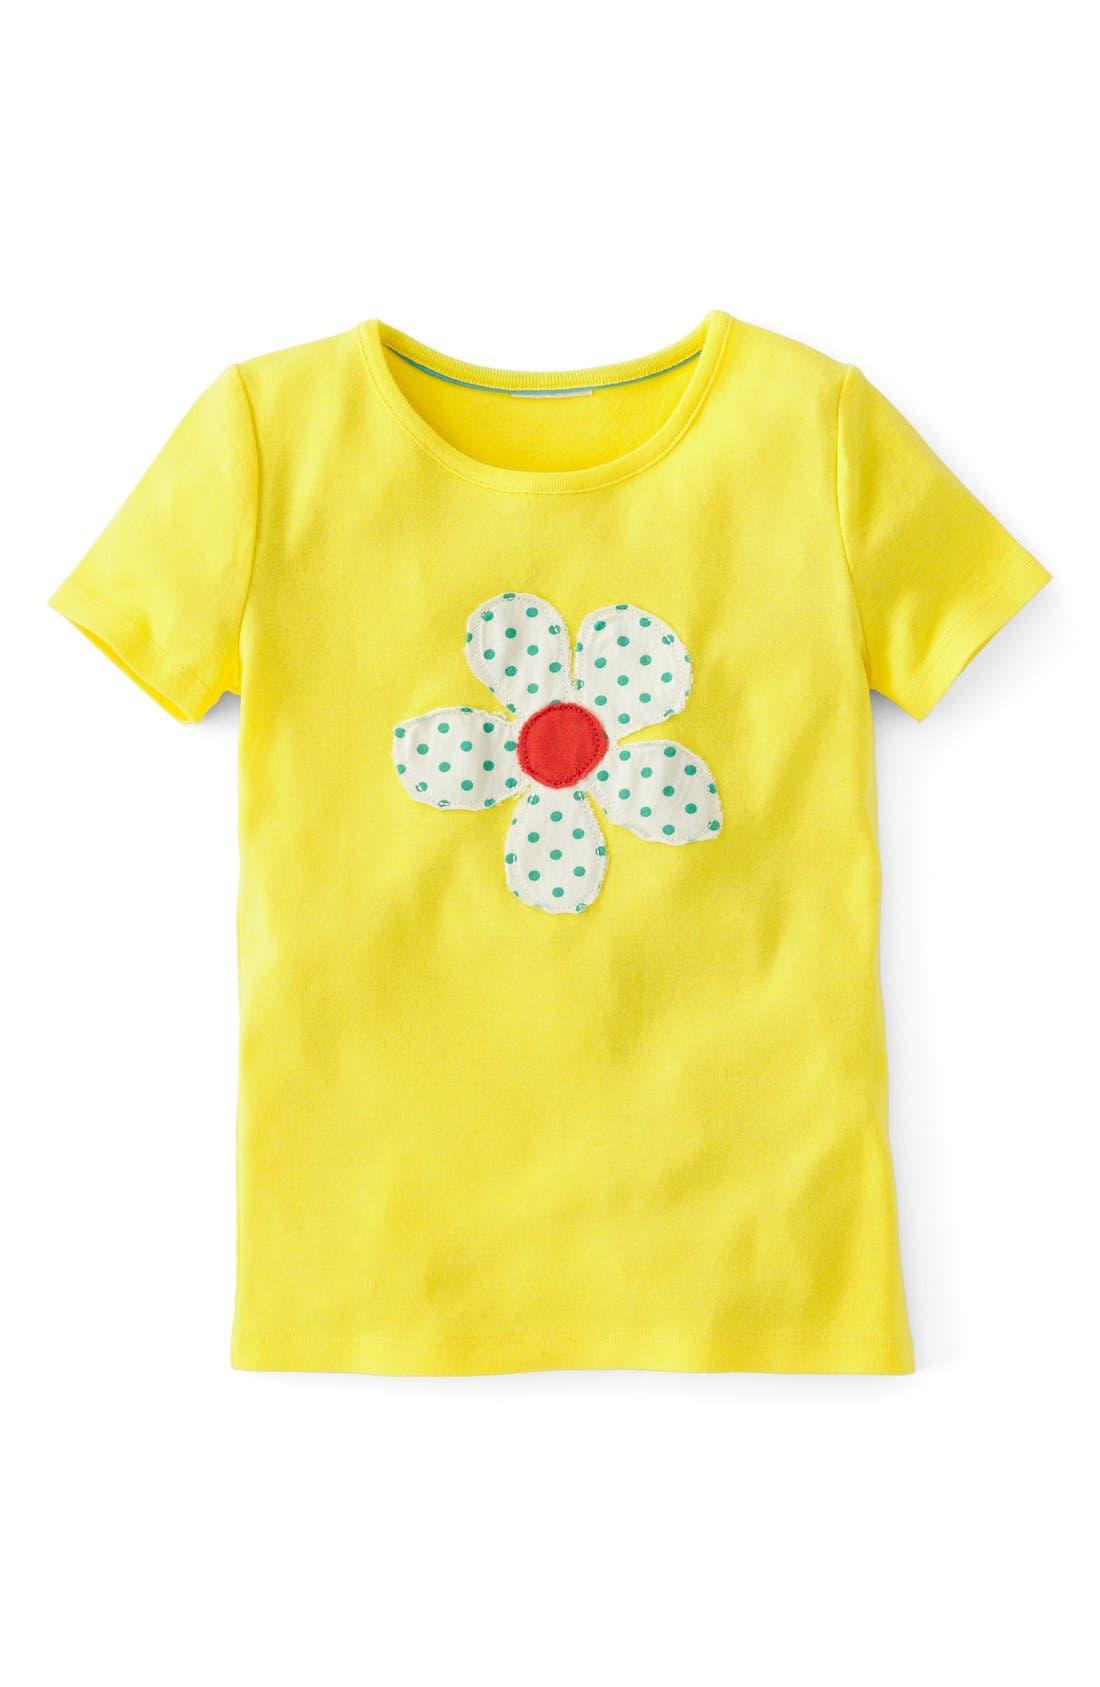 Main Image - Mini Boden 'Dotty' Appliqué Tee (Toddler Girls, Little Girls & Big Girls)